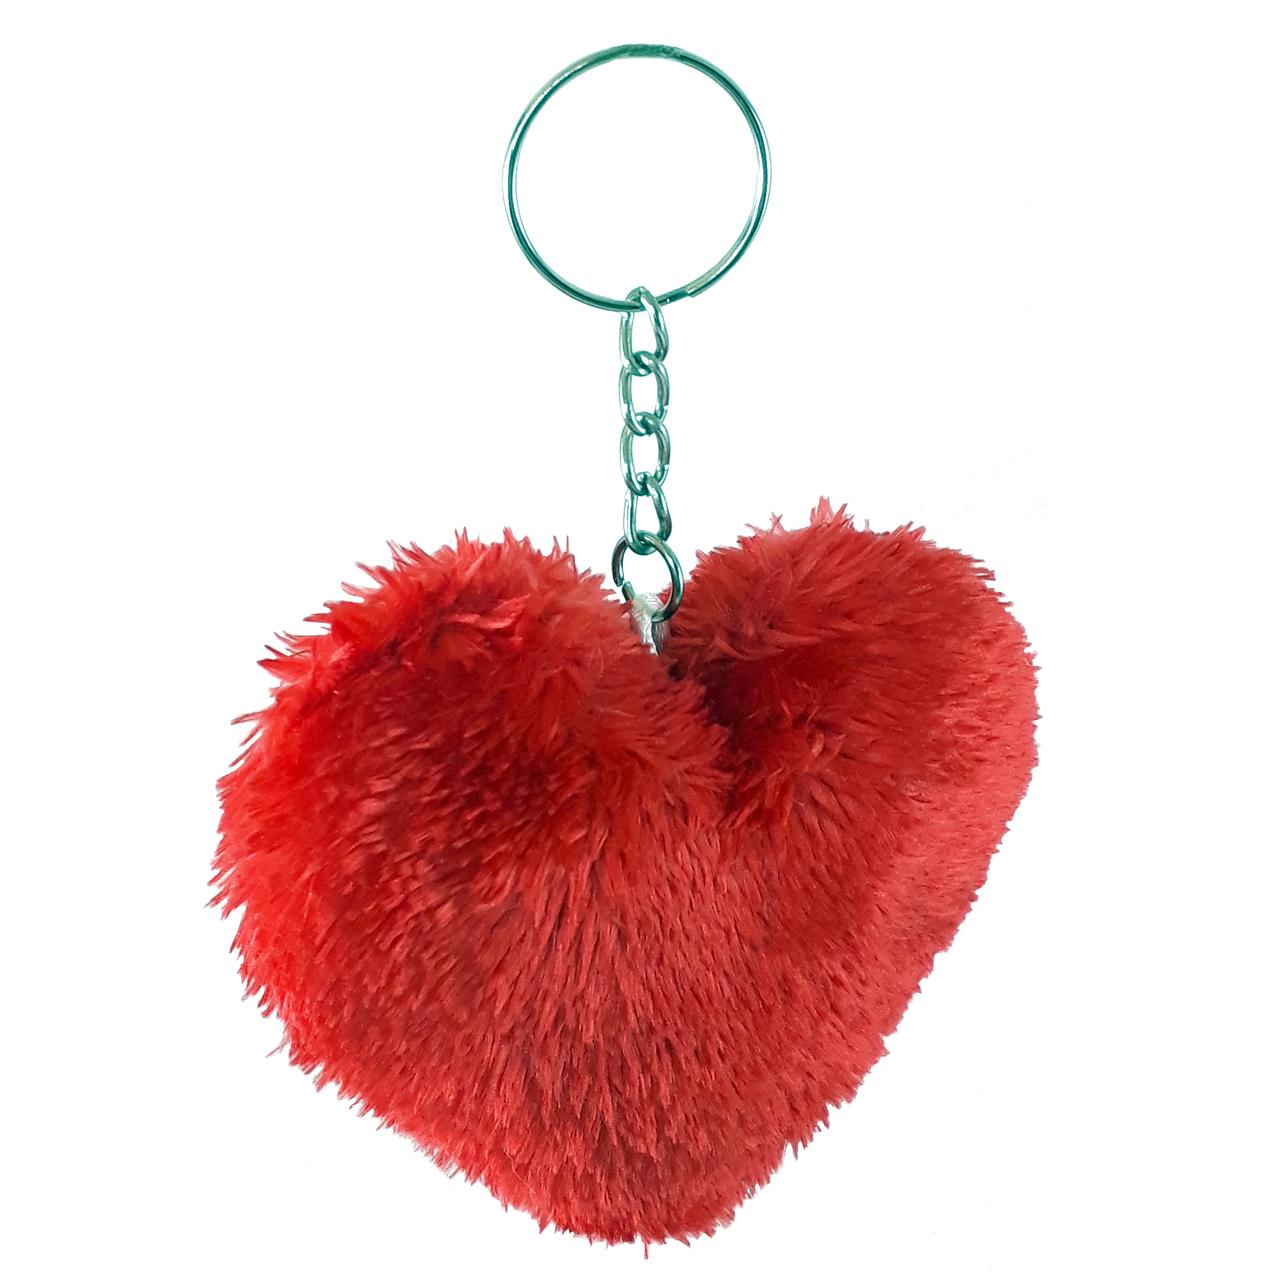 آویز طرح قلب کد M11